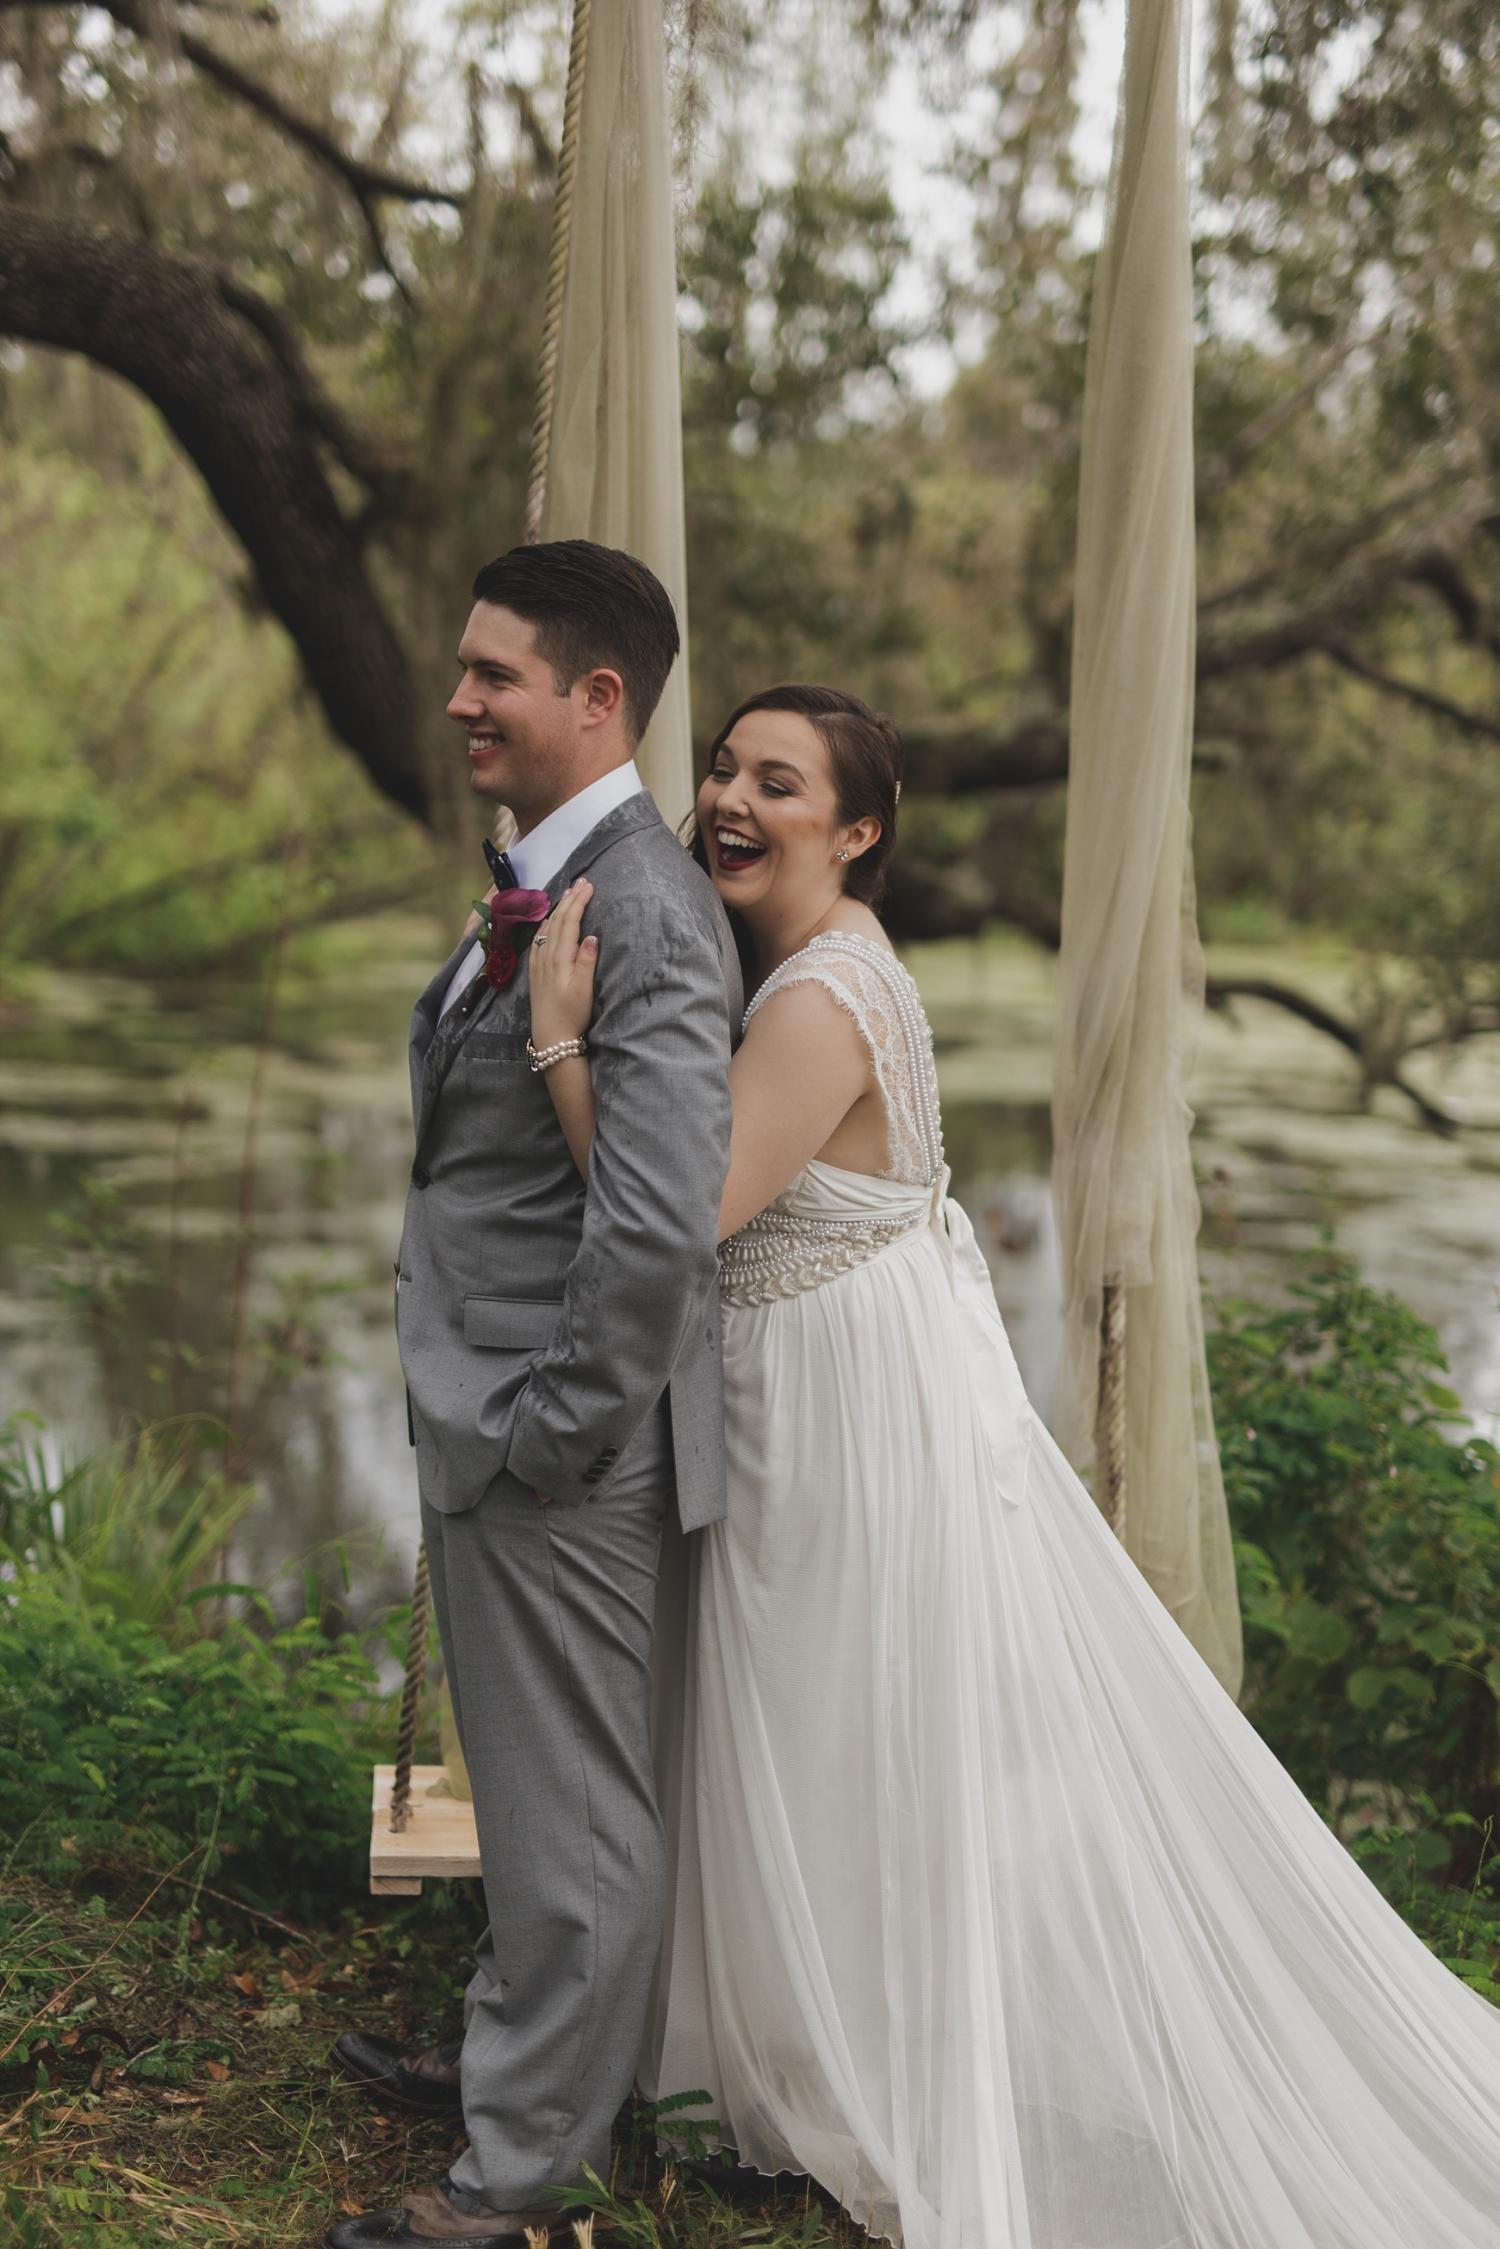 Stacy Paul Photography - destination wedding photographer Florida boho wedding_0078.jpg